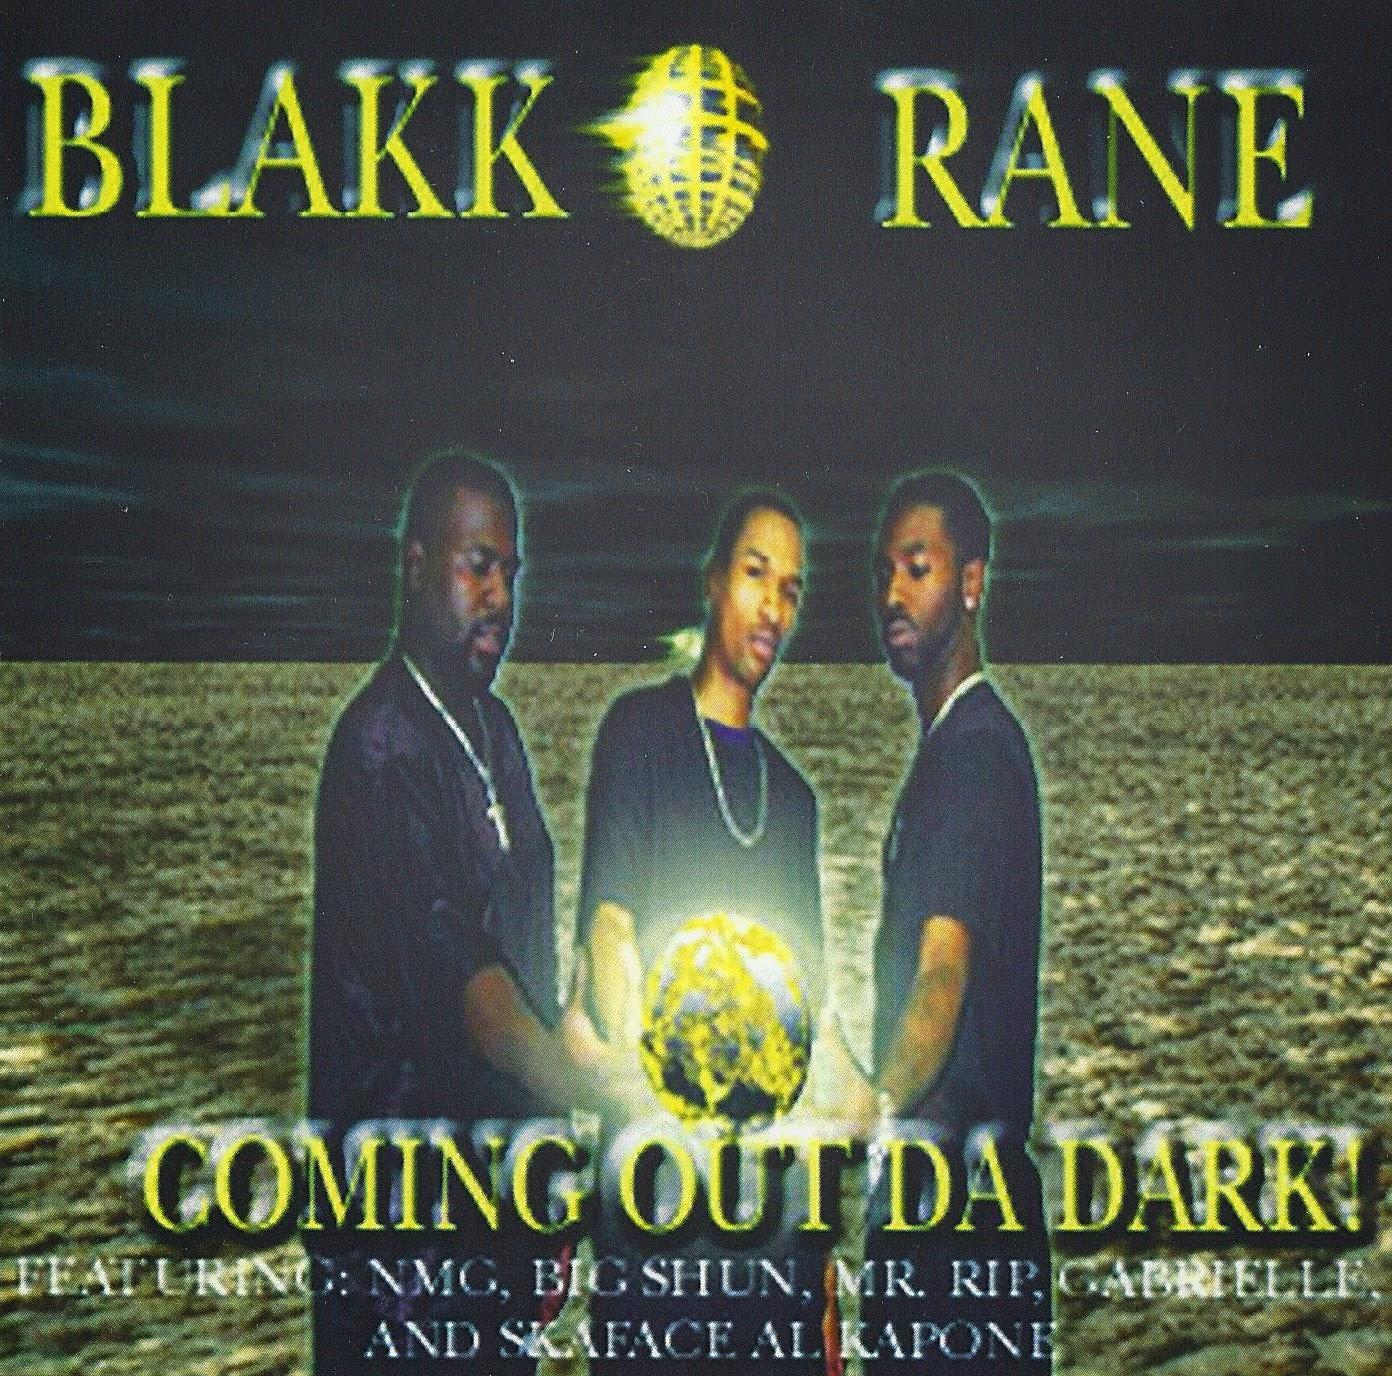 Blakk Rane - Coming Out Da Dark!